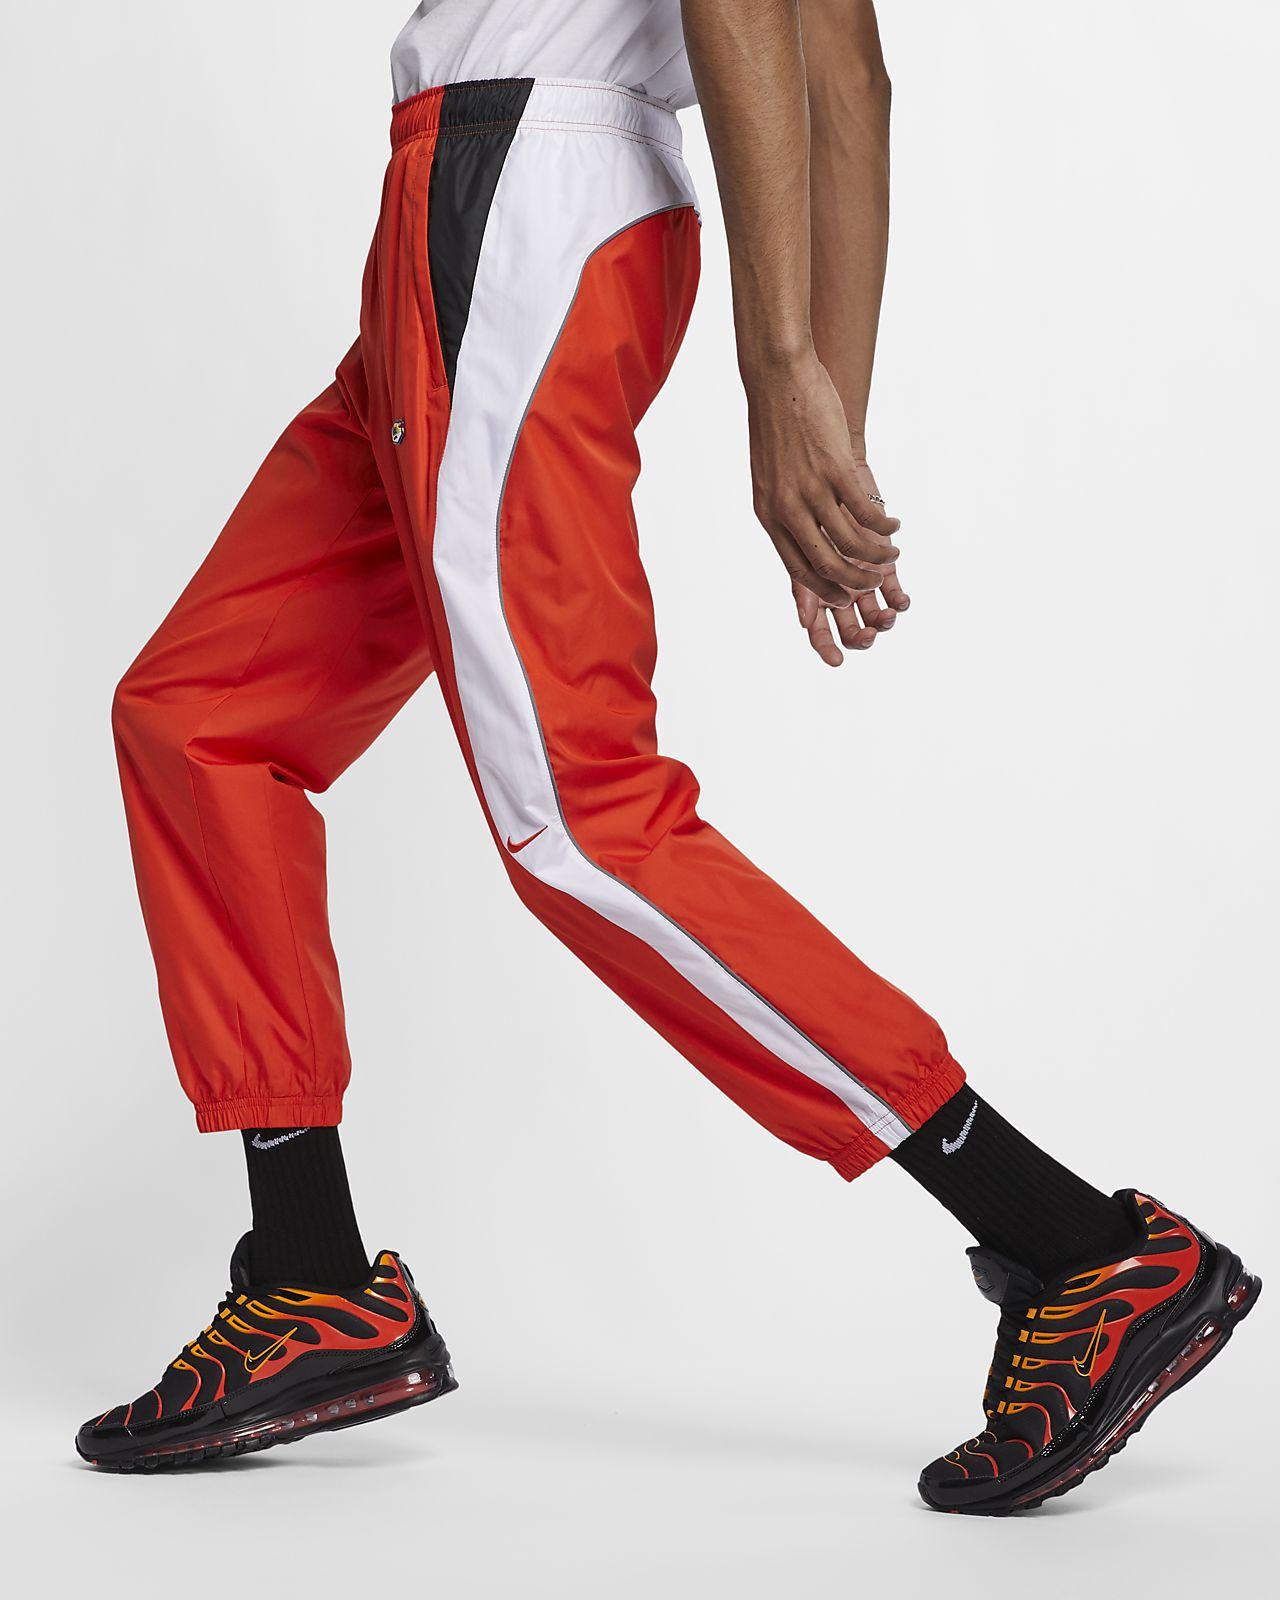 NikeLab Collection Tn løpebukse til herre